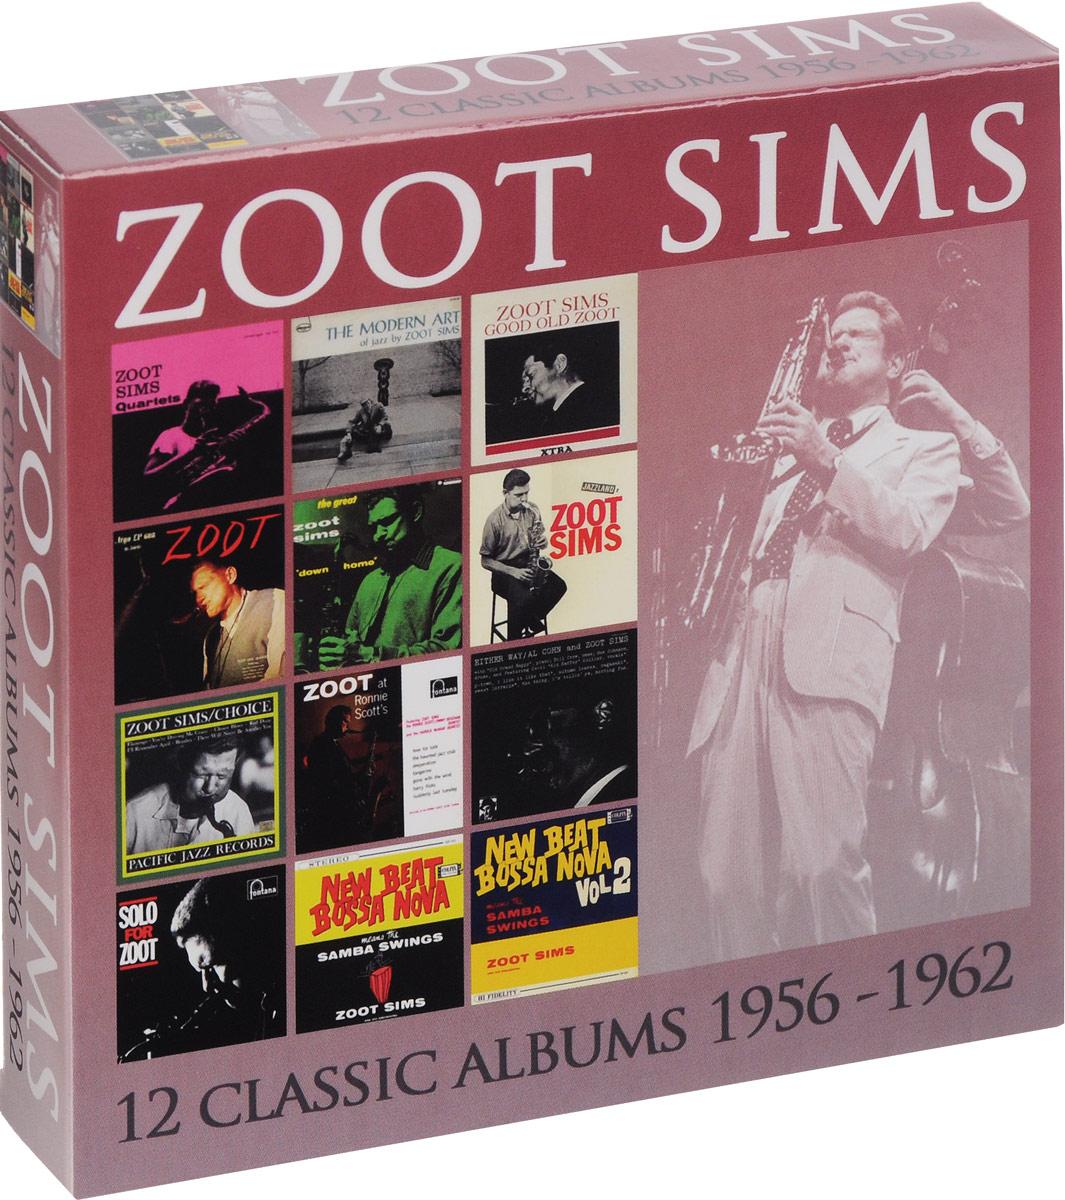 Зут Симс Zoot Sims. 12 Classic Albums 1956 - 1962 (6 CD)